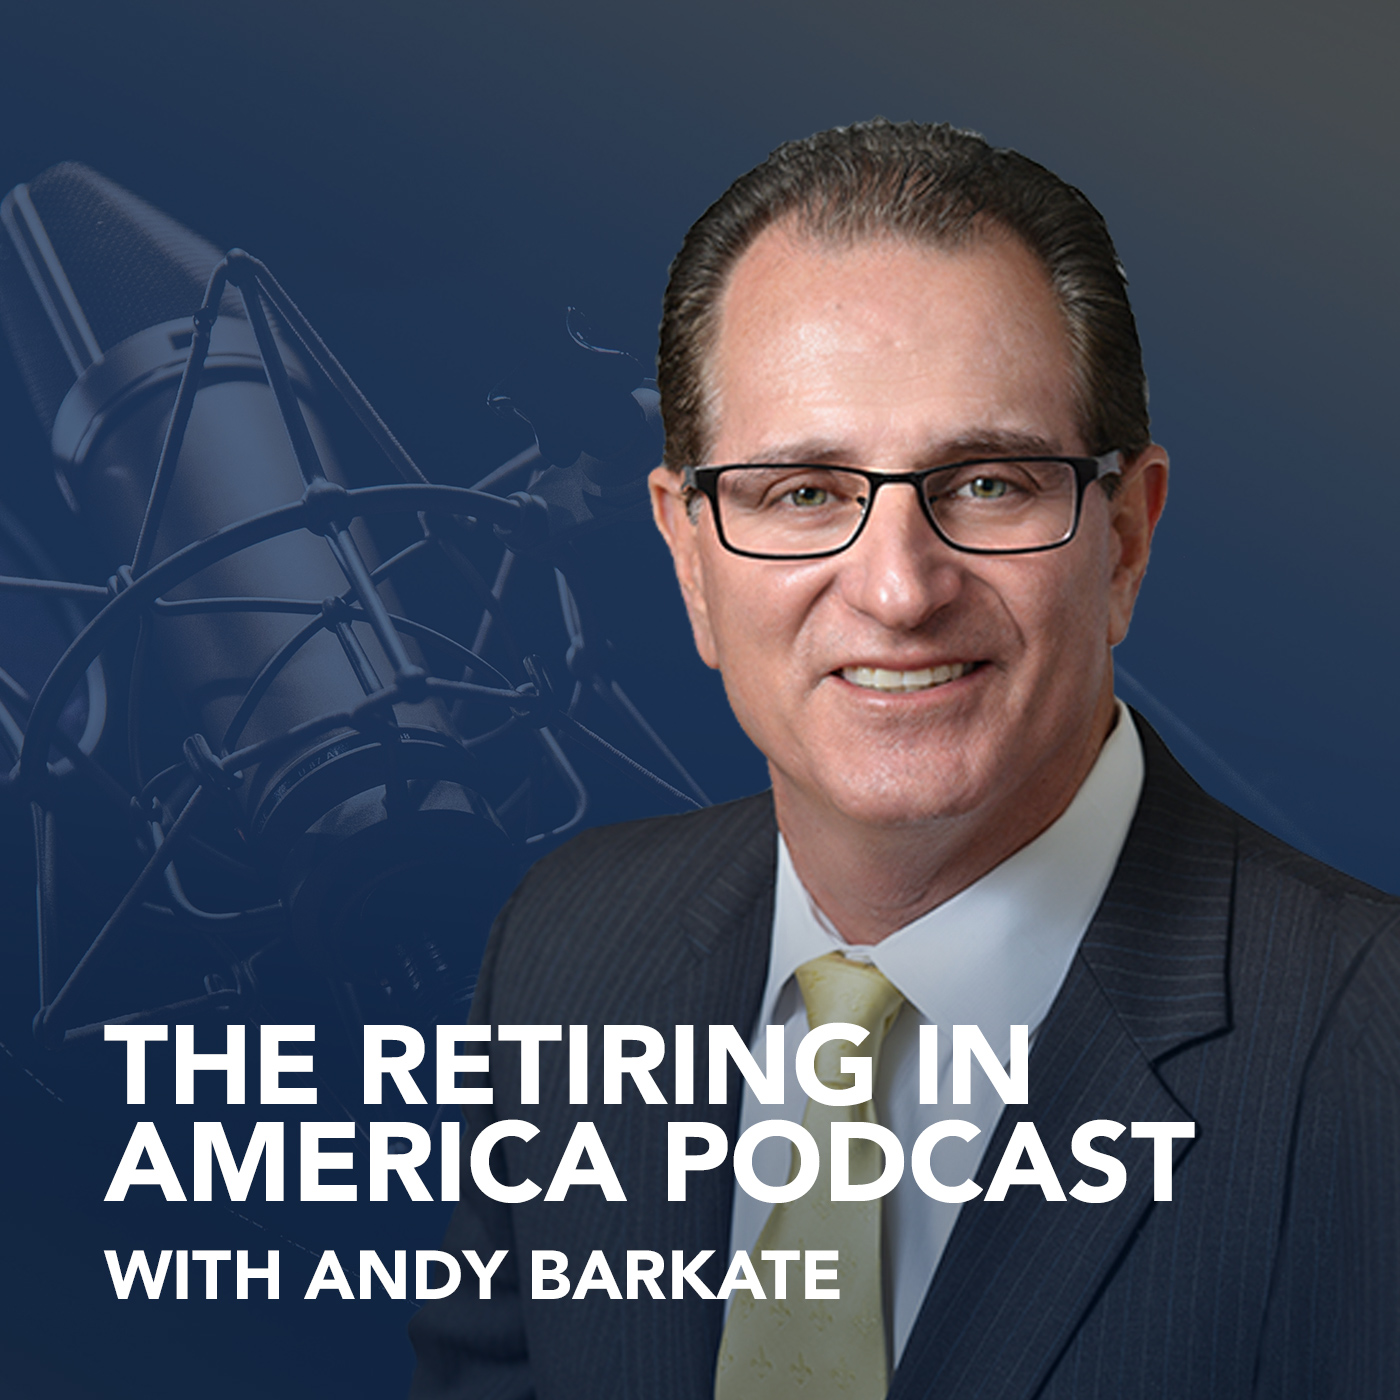 The Retiring in America Podcast show art